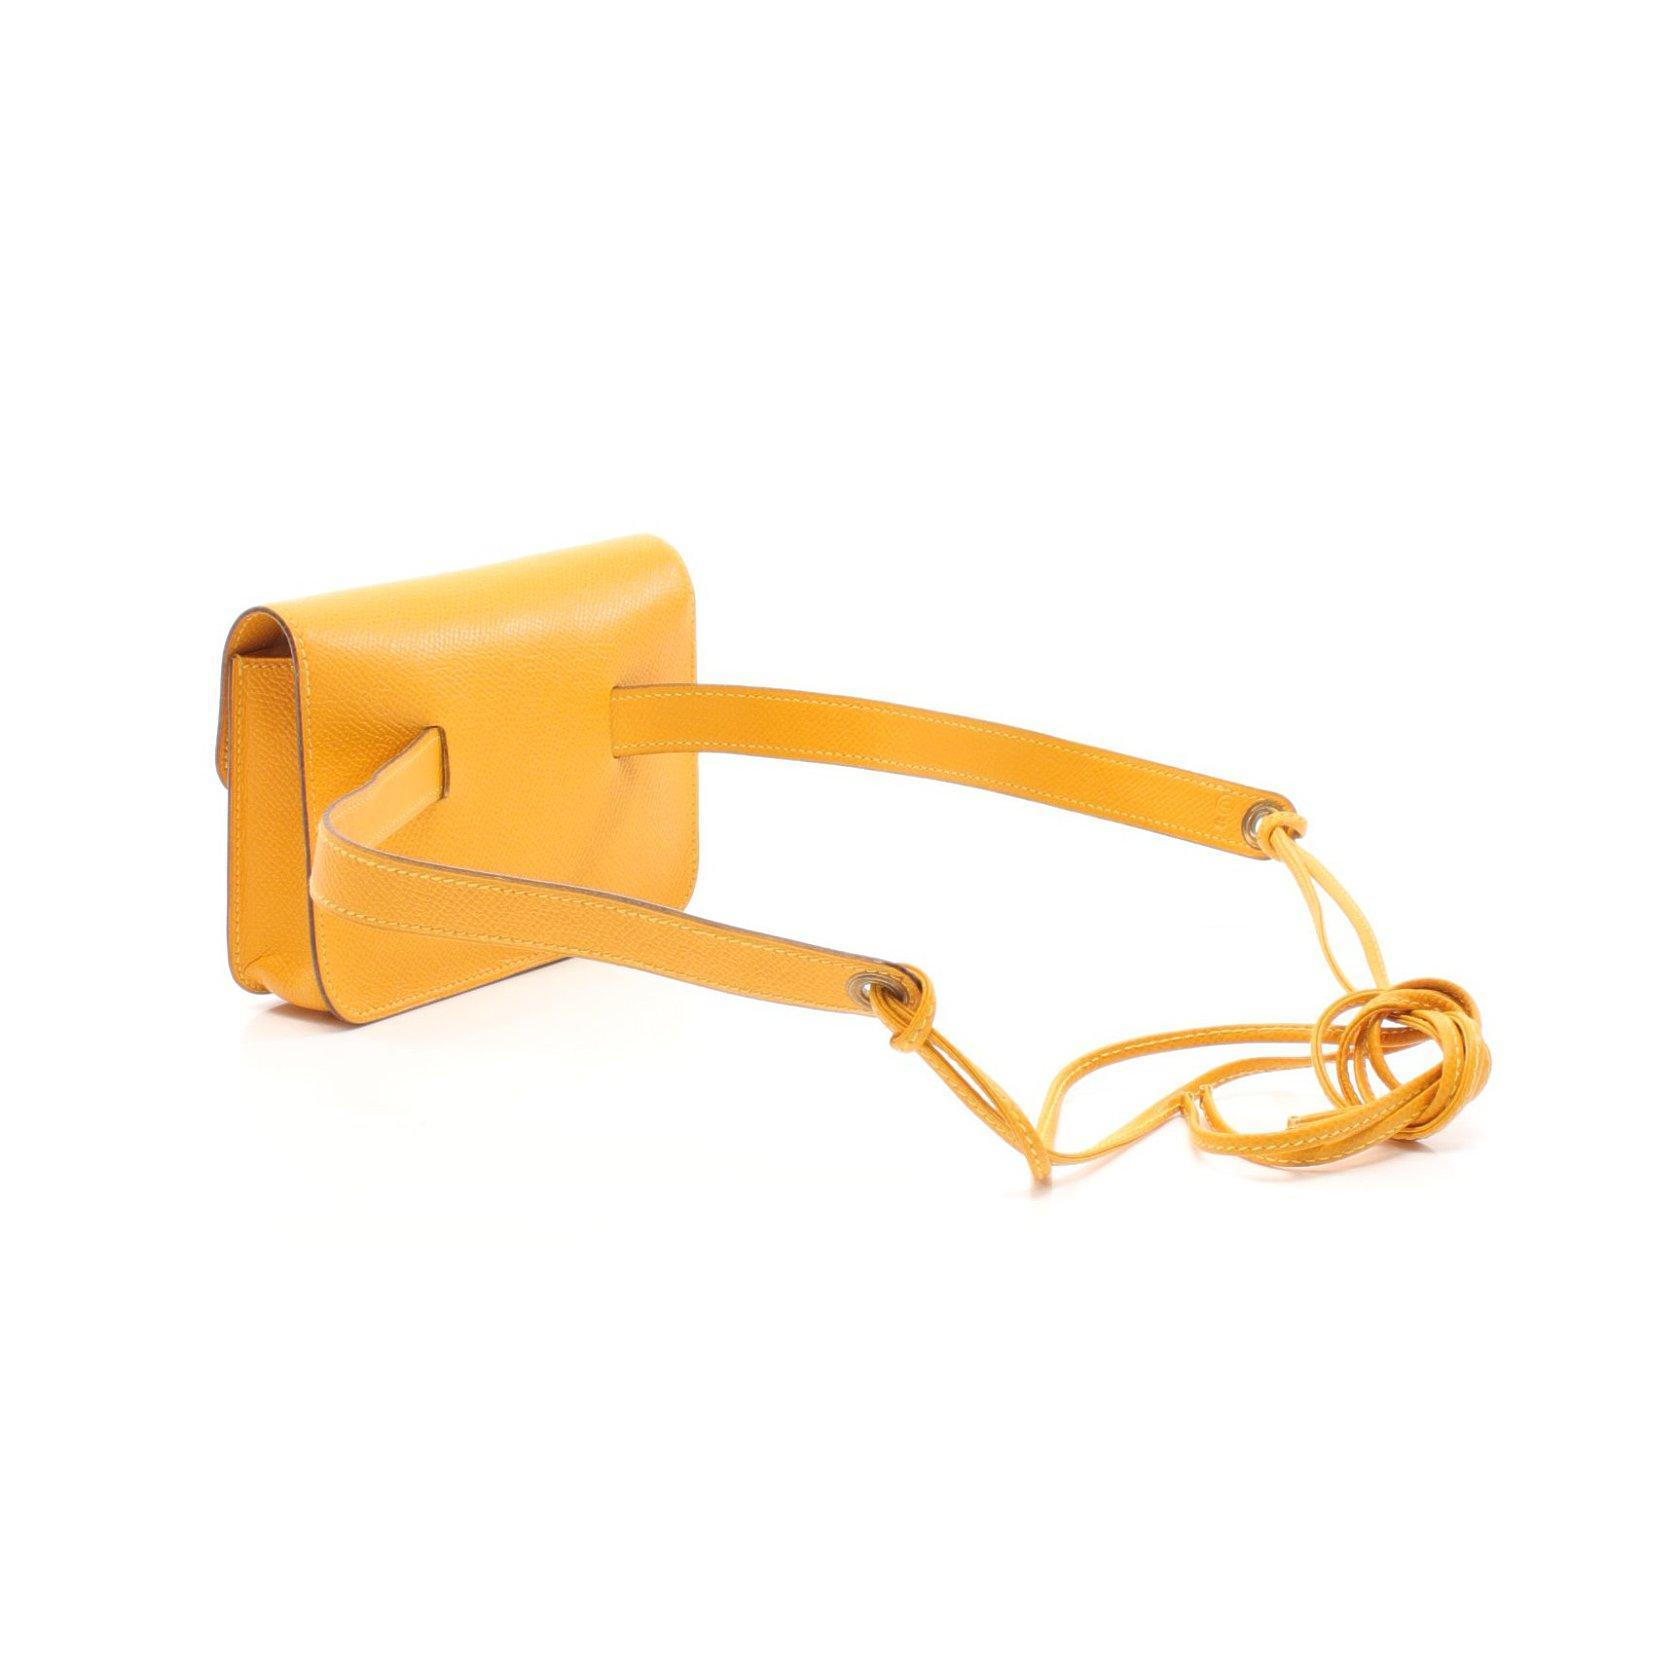 HERMES・バッグ・ポシェットグリーン ジョーヌ ボディバッグ ウエストバッグ クシュベル イエロー 〇U刻印 ゴールド金具